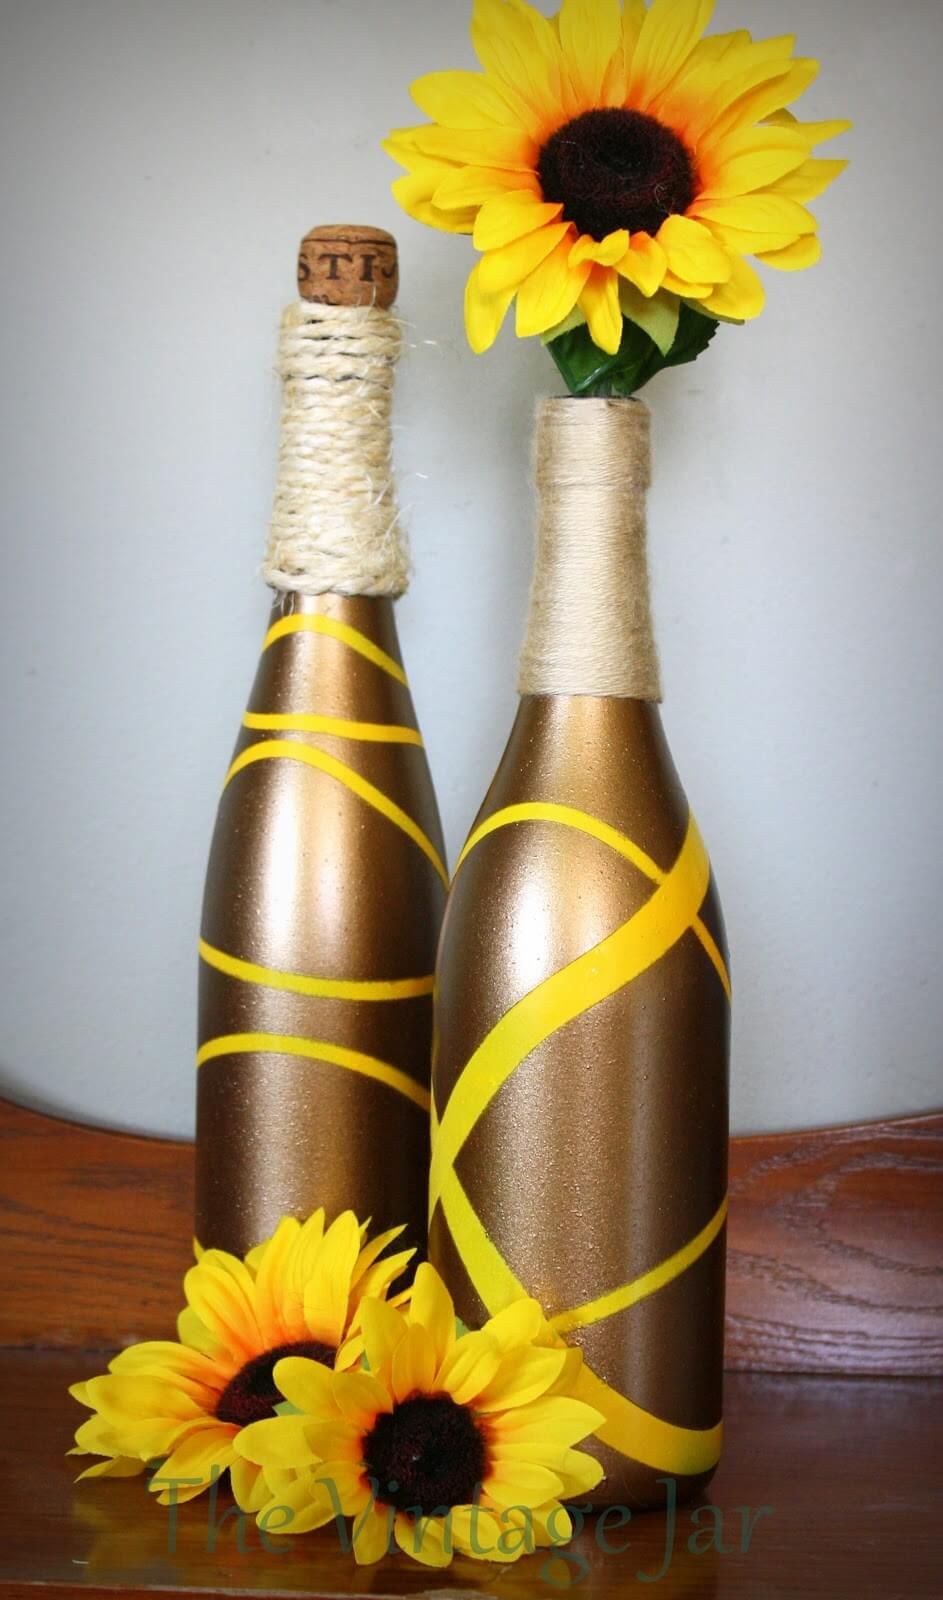 manualidades para reciclar botellas de vino 21